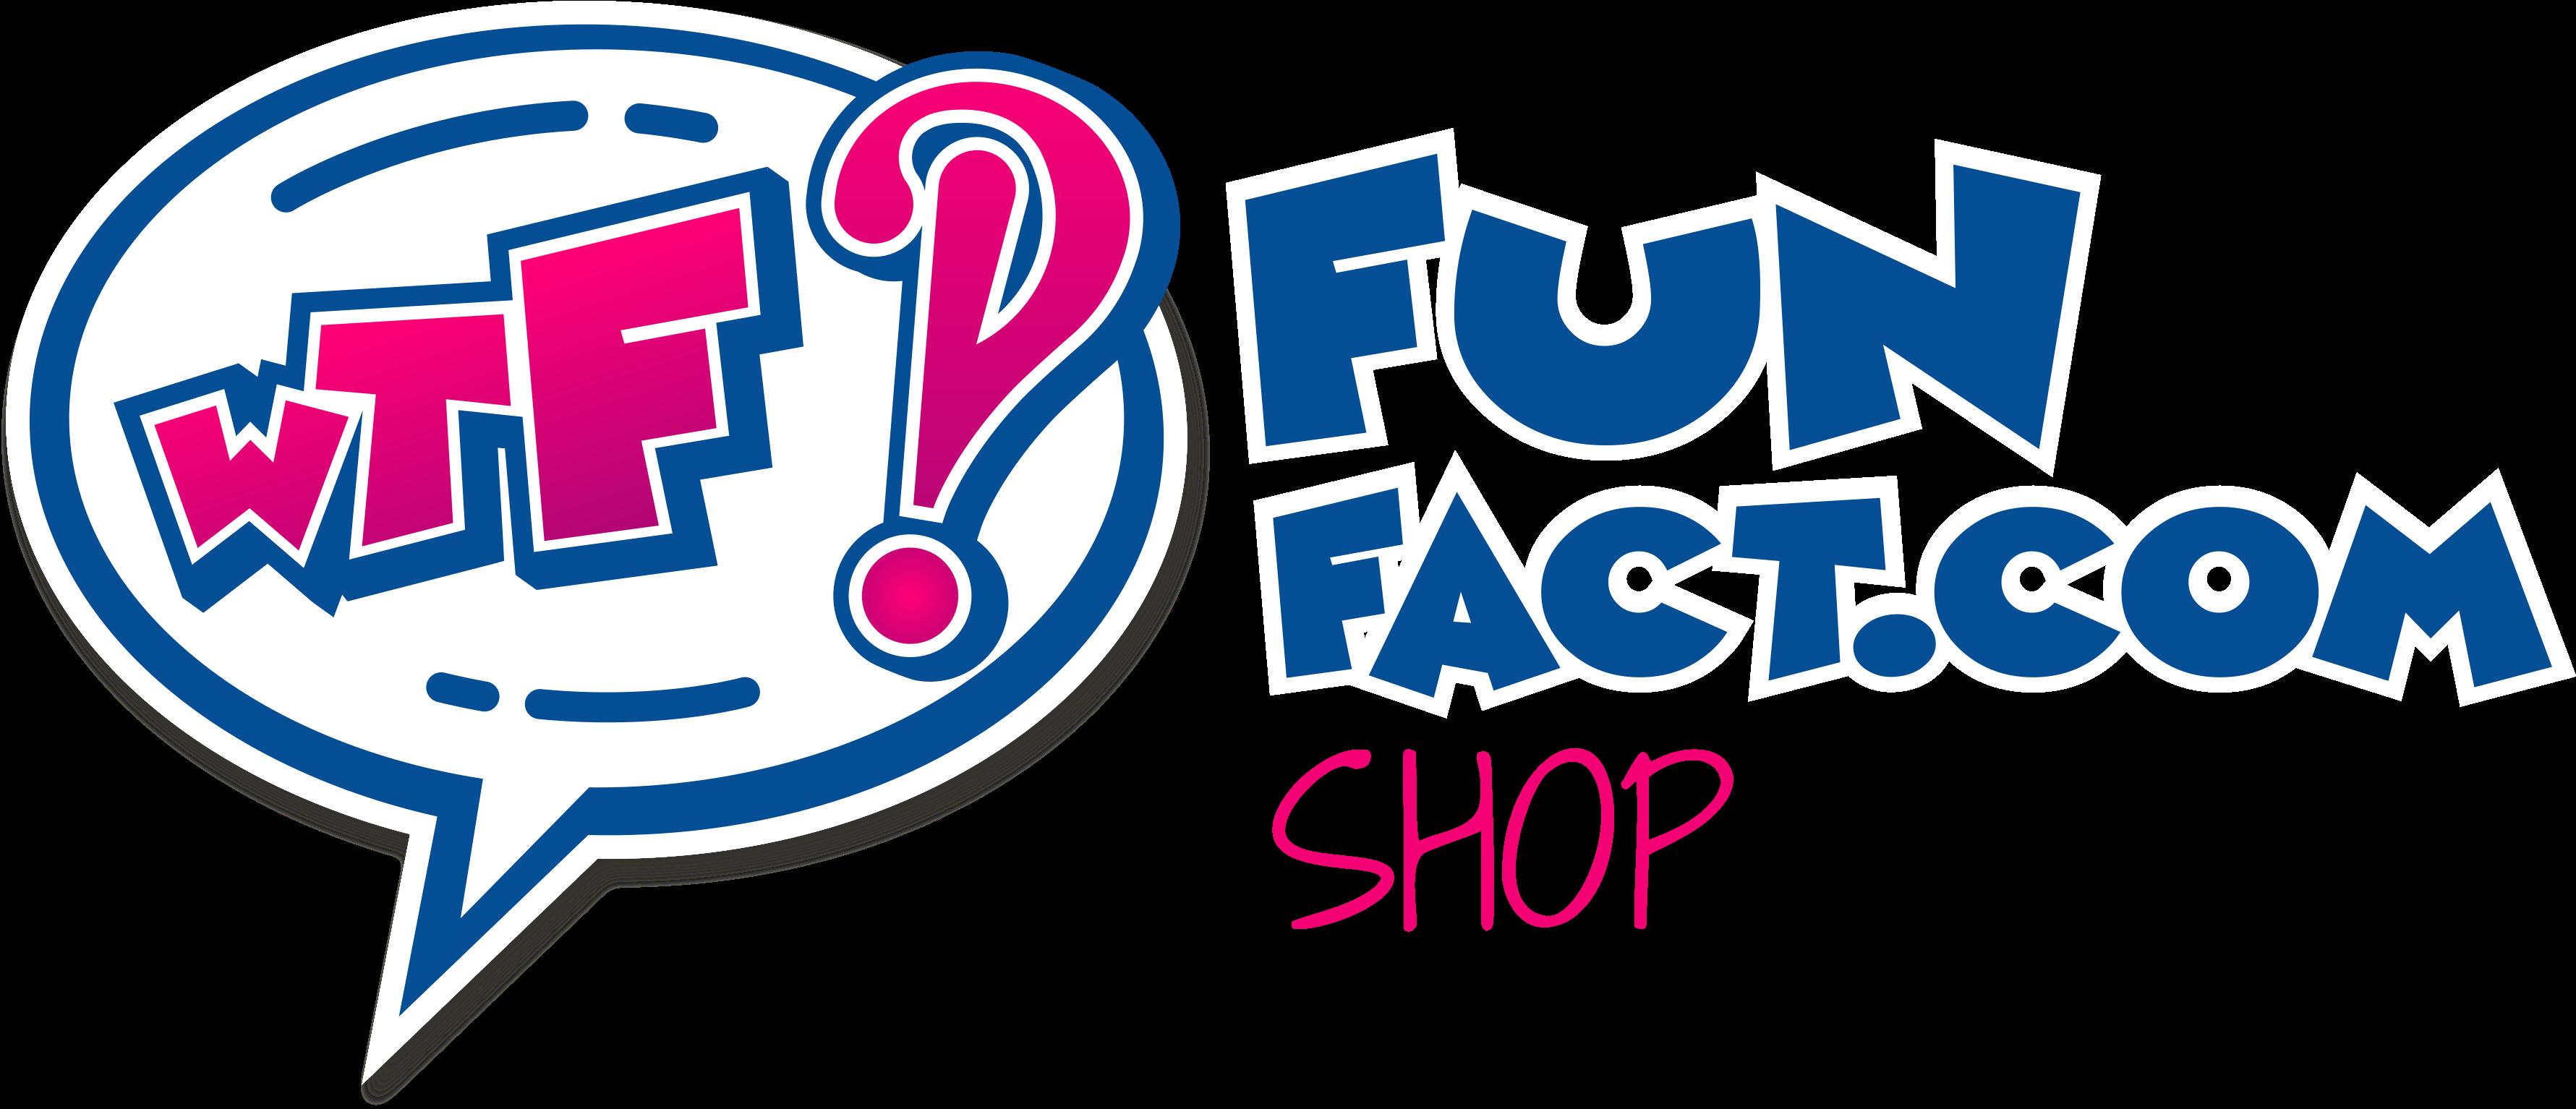 WTFFunFact.com Shop